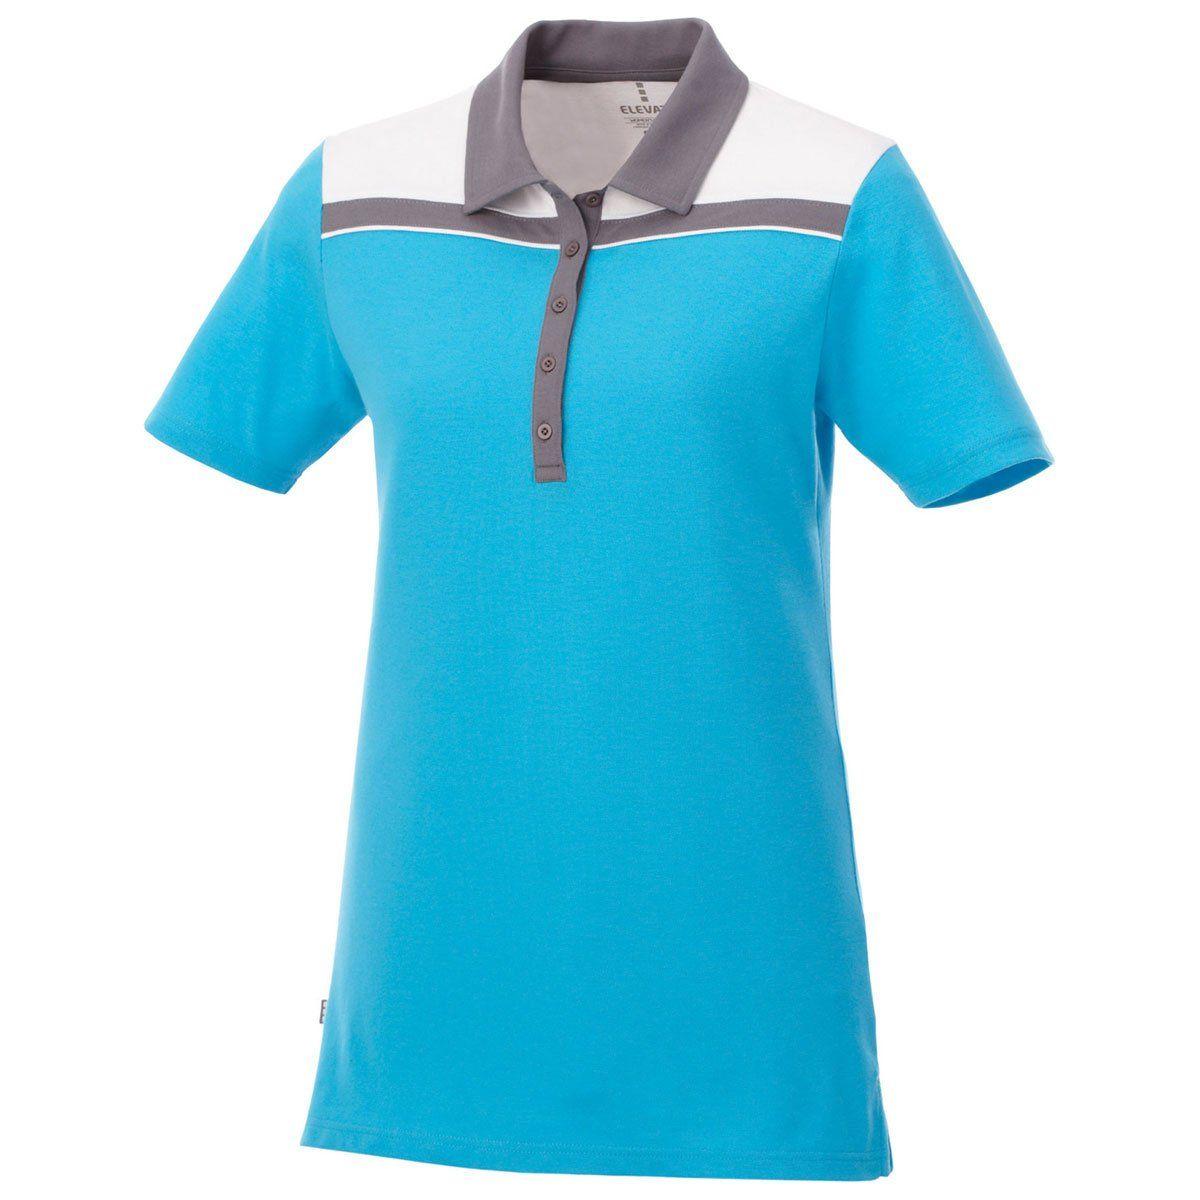 66b090c8 Elevate Women's Chill/Steel Grey/White Gydan Short Sleeve Polo ...